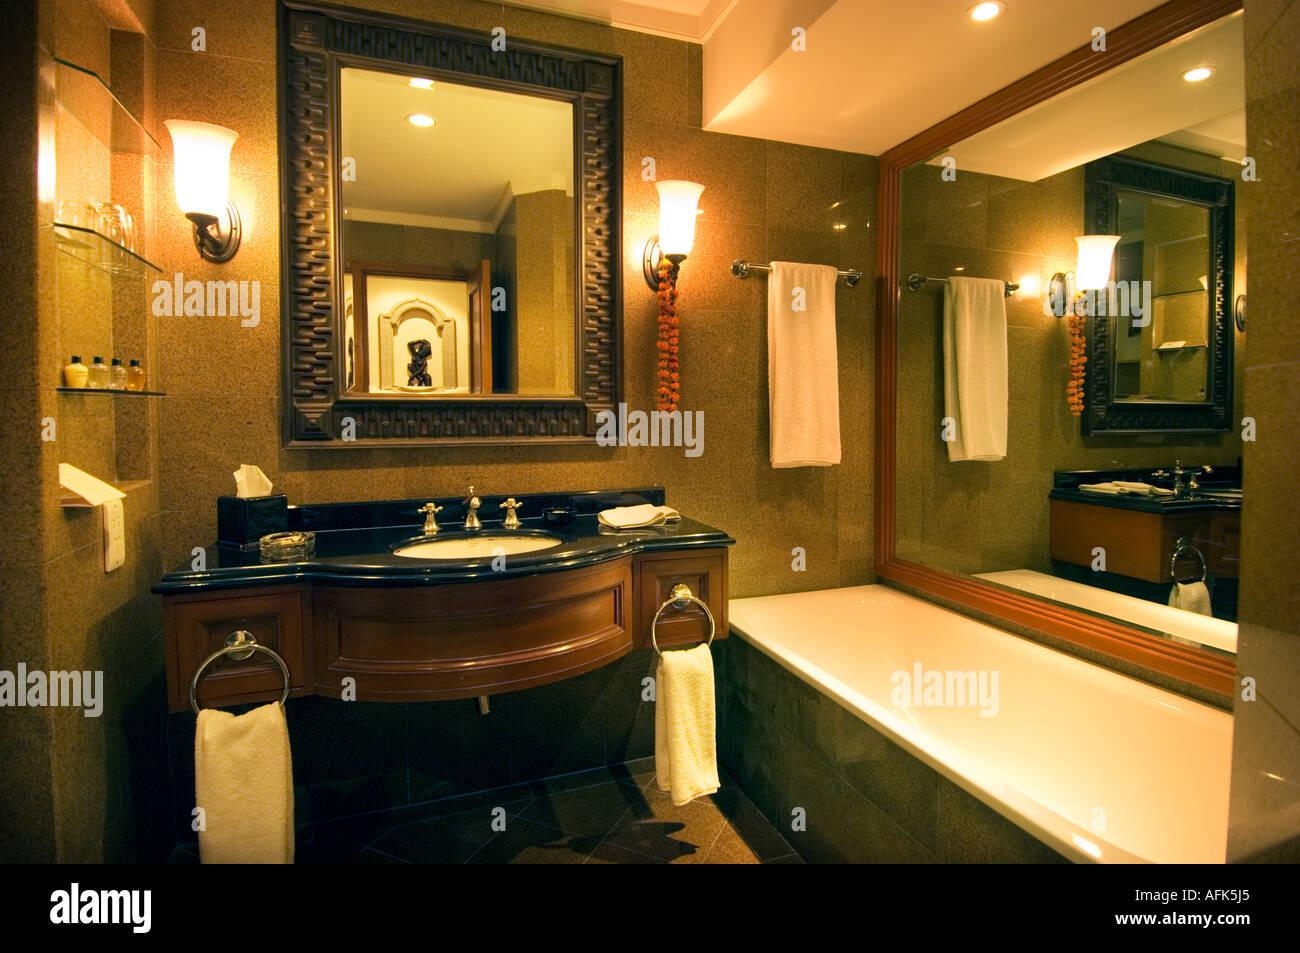 The HYATT REGENCY HOTEL in Katmandu Kathmandu Nepal bath bathroom ...